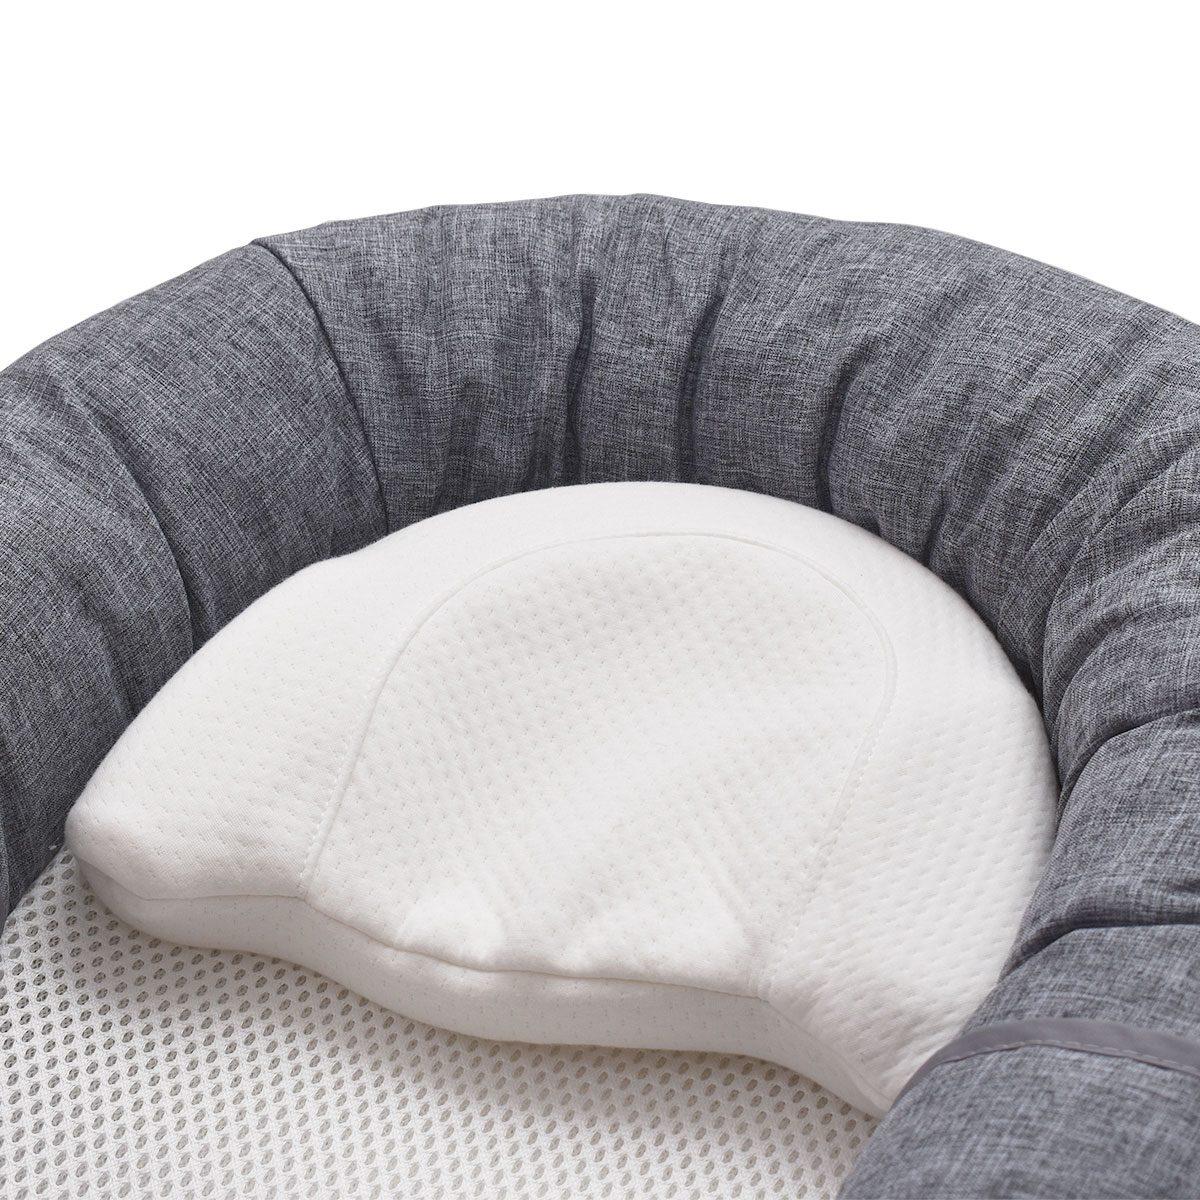 grey-baby-nest-update-3